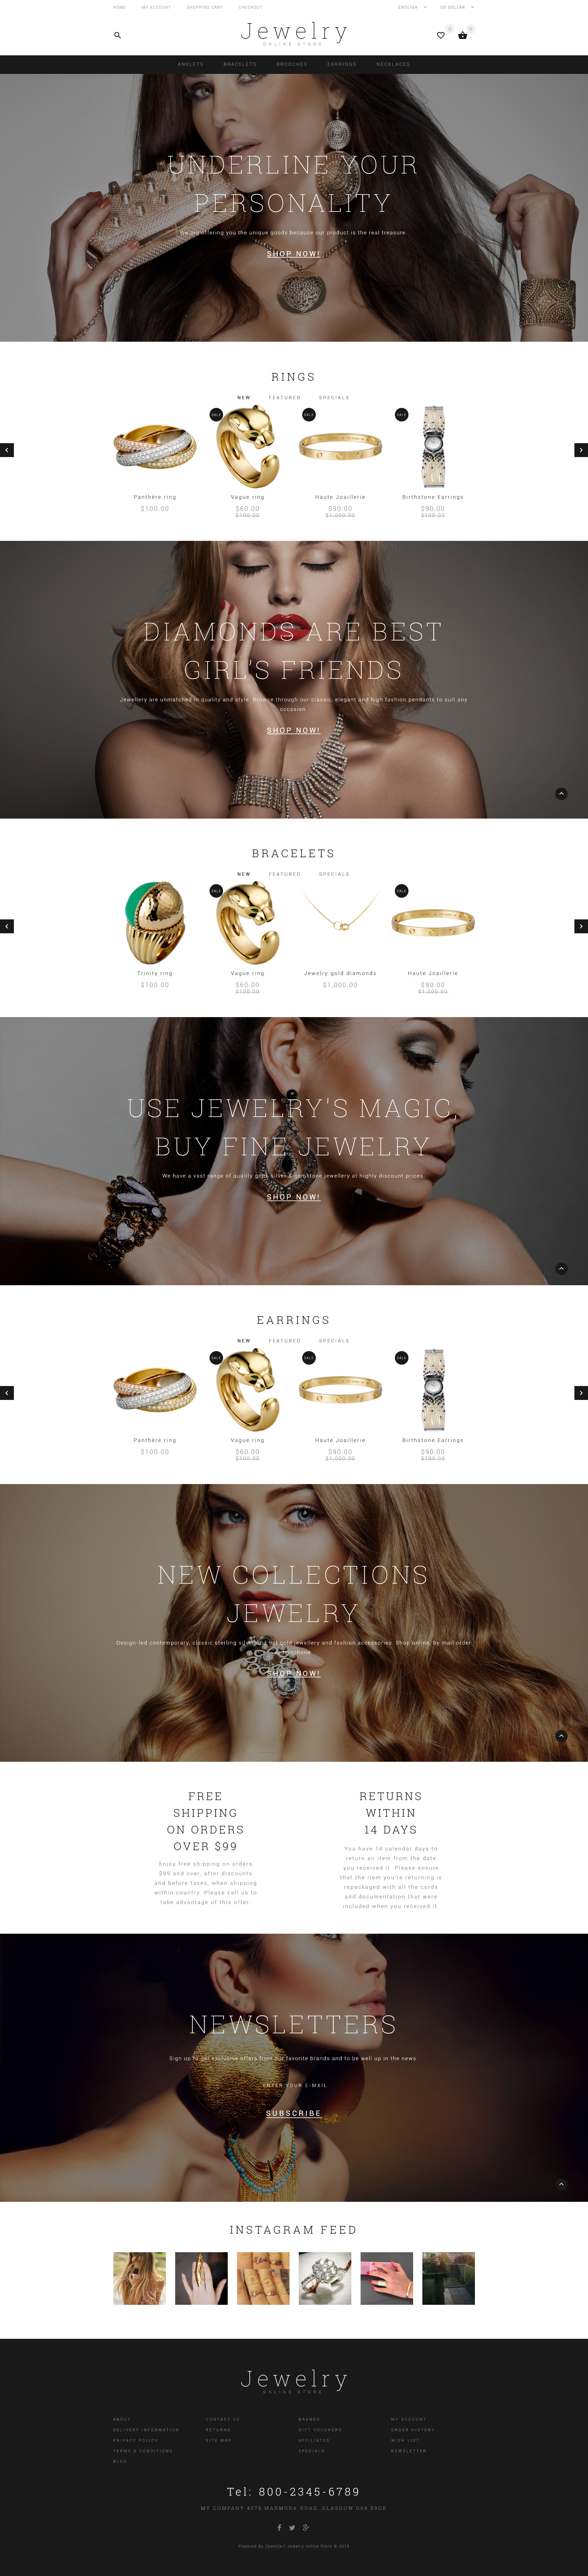 Jewelry Showcase OpenCart Template